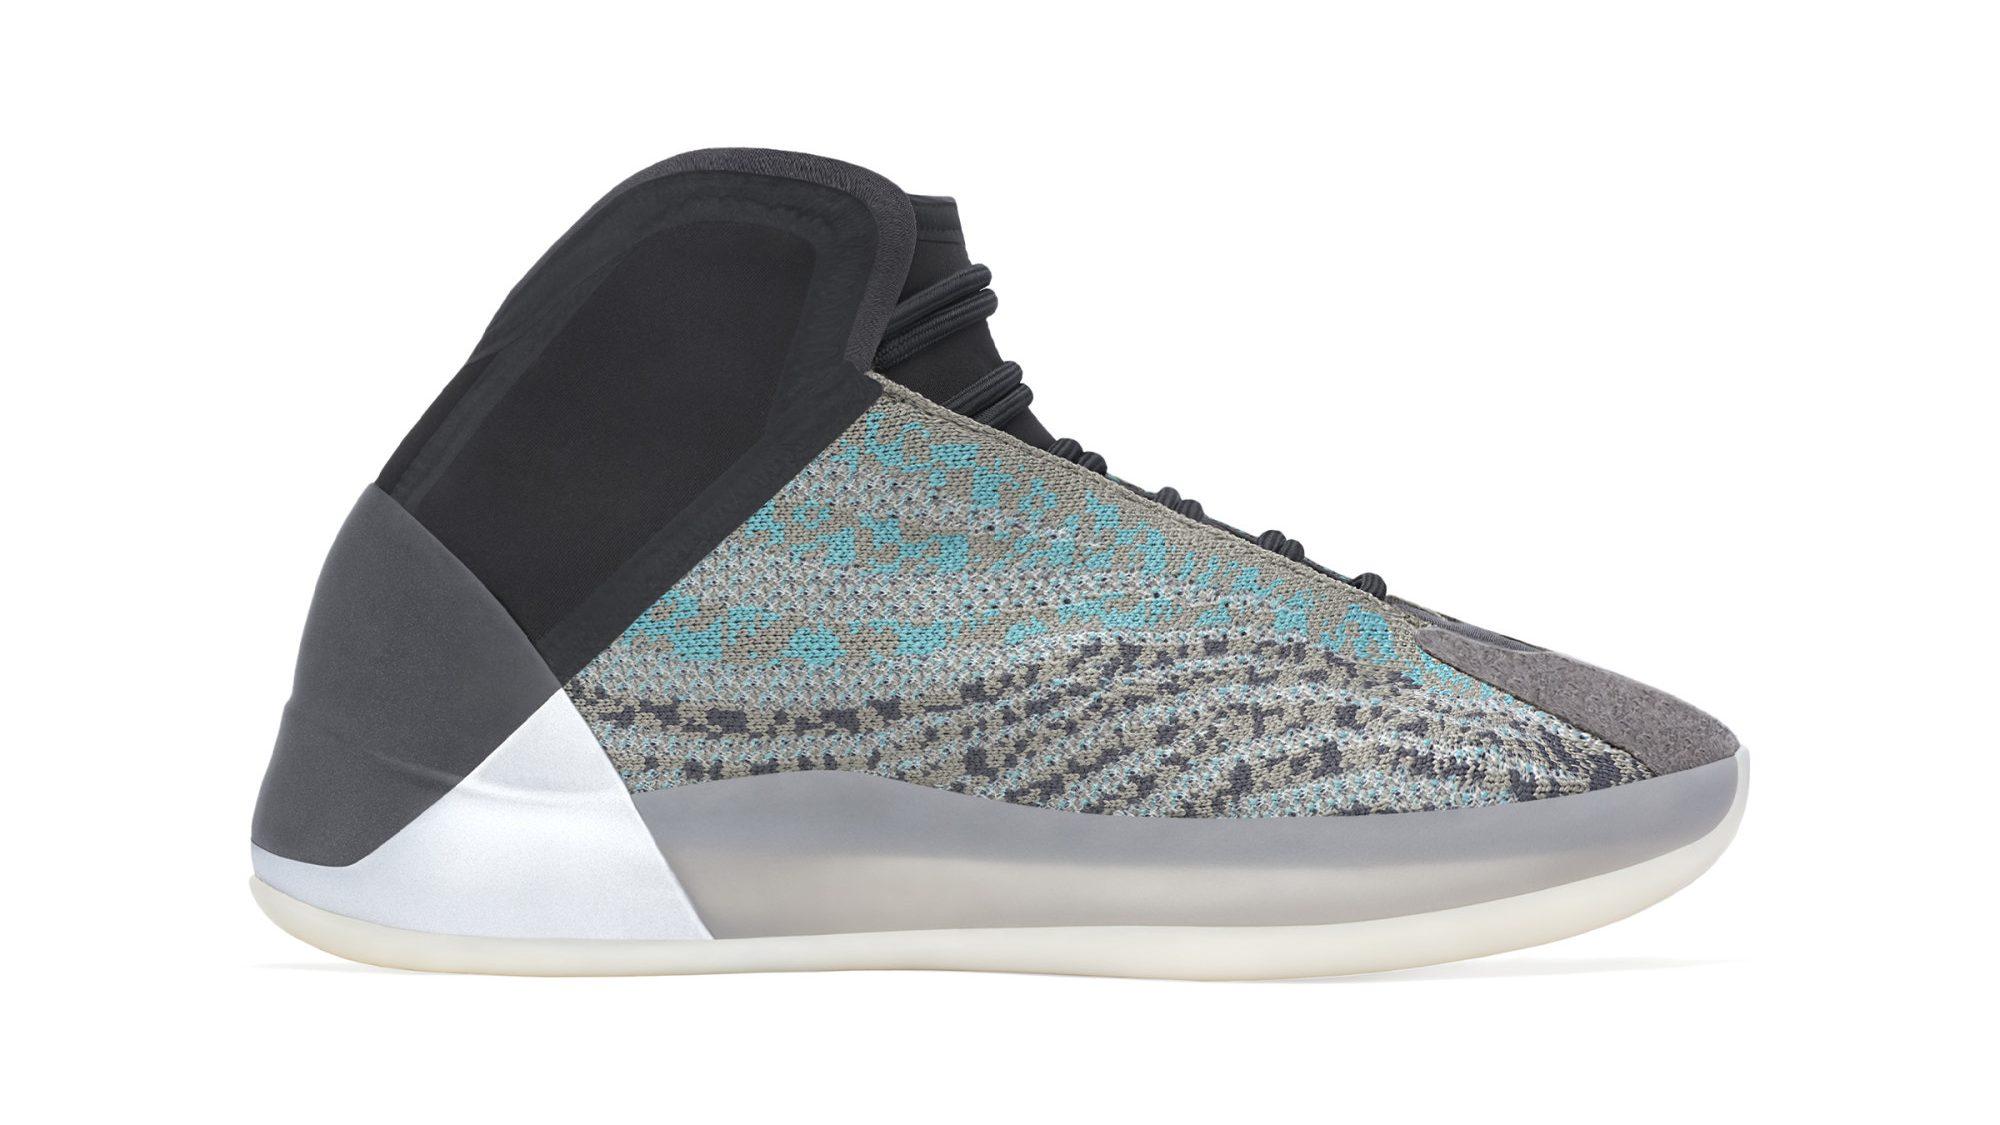 Adidas Yeezy Qntm 'Teal Blue' Release